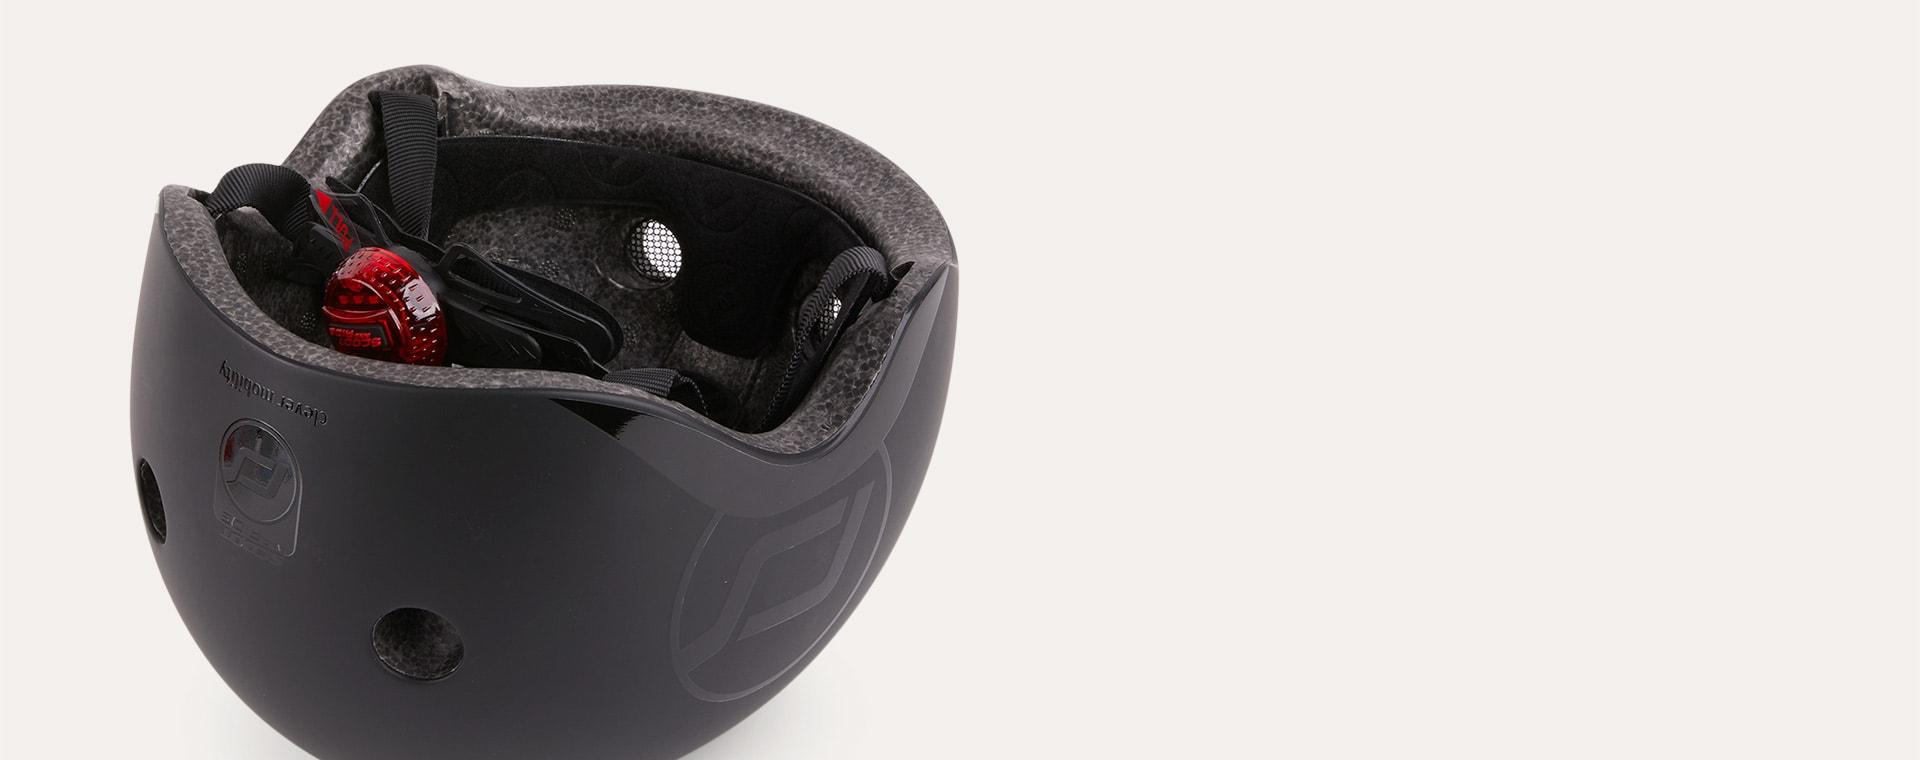 Black Scoot & Ride Highway Kick 3 LED Helmet